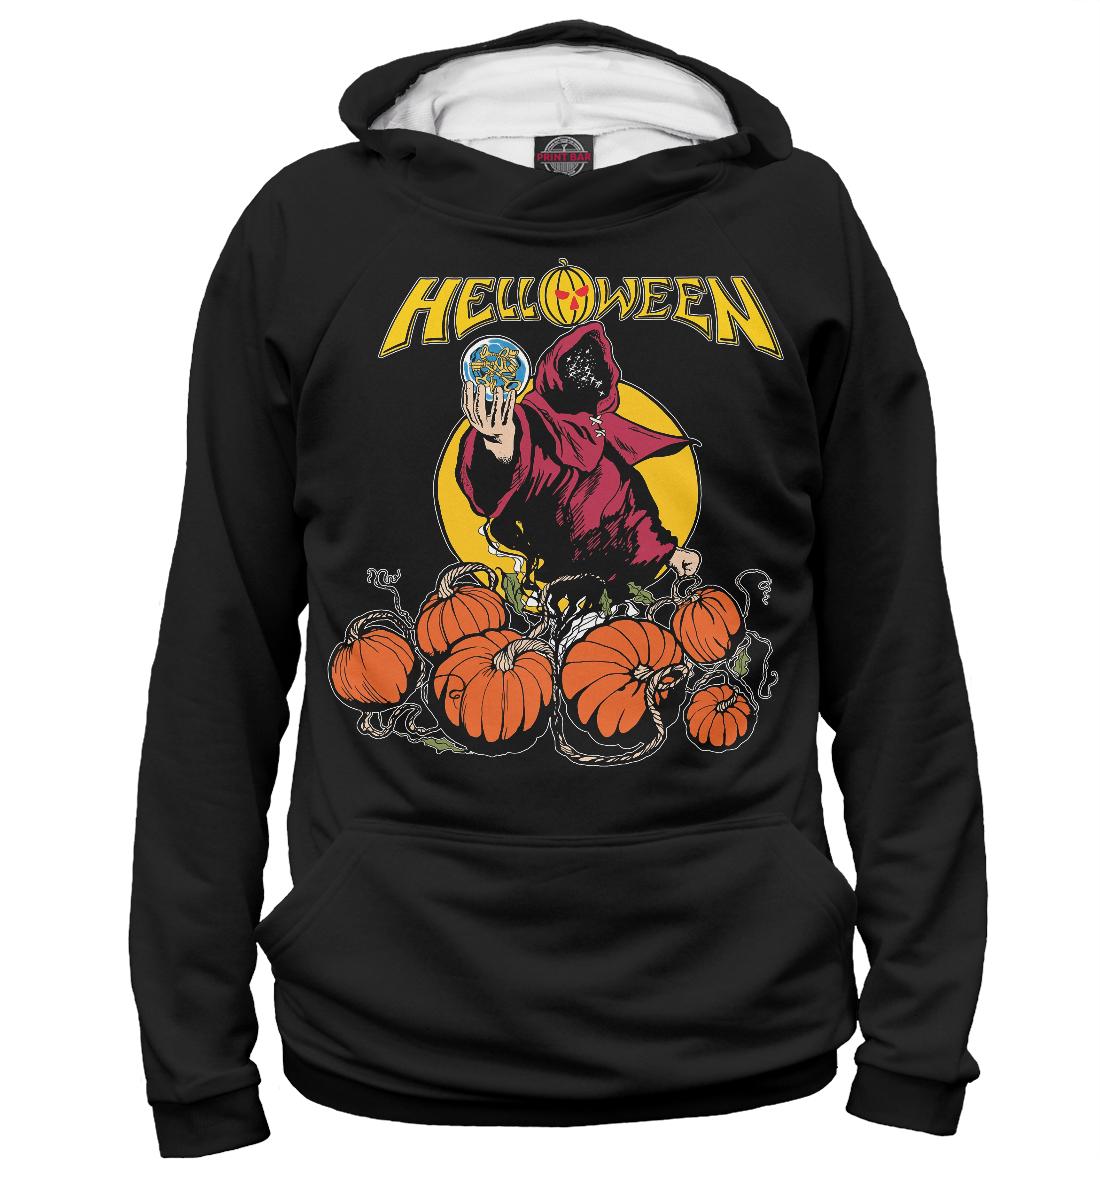 Купить Helloween, Printbar, Худи, MZK-550975-hud-1